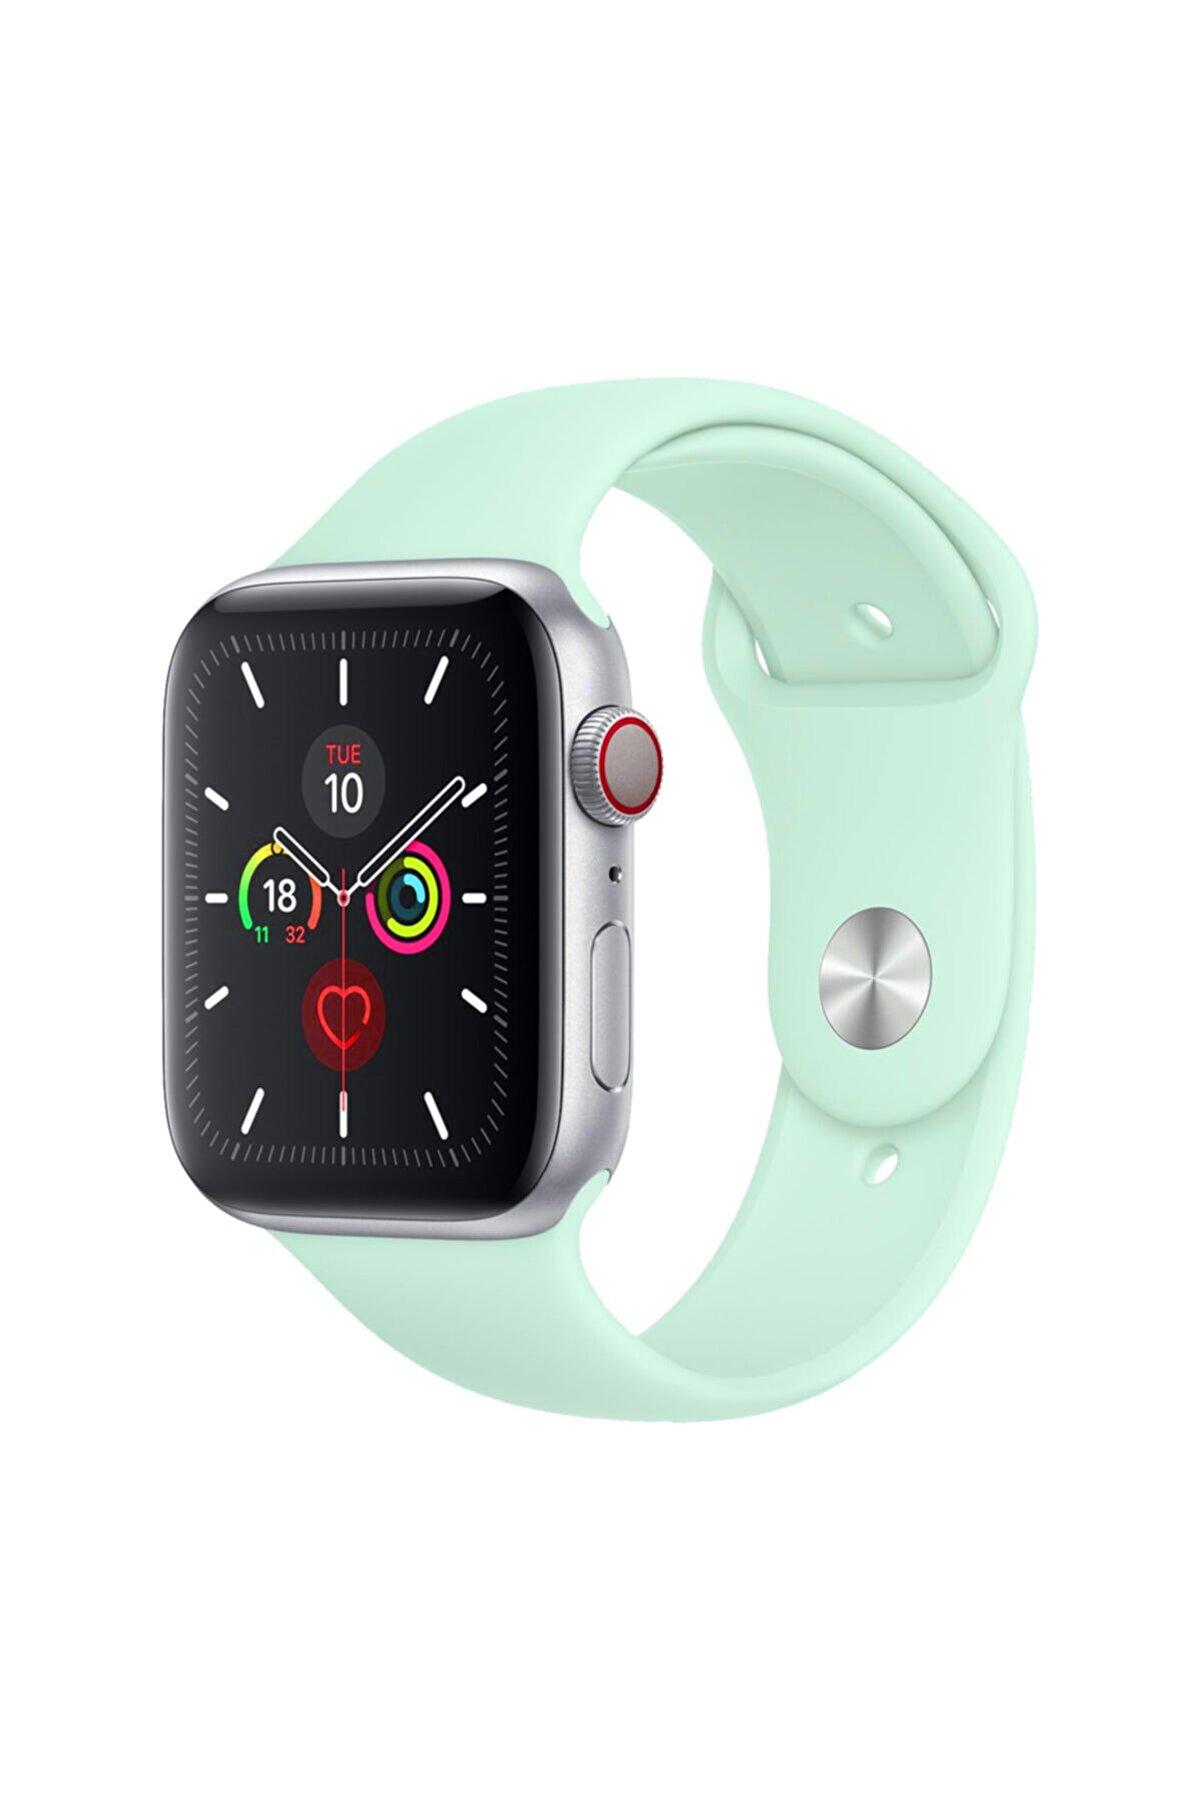 Cimricik Apple Watch Kordon 2 3 4 5 6 Se Seri 38 Mm Ve 40 Mm Uyumlu Silikon Kordon Kayış - Marina Yeşili